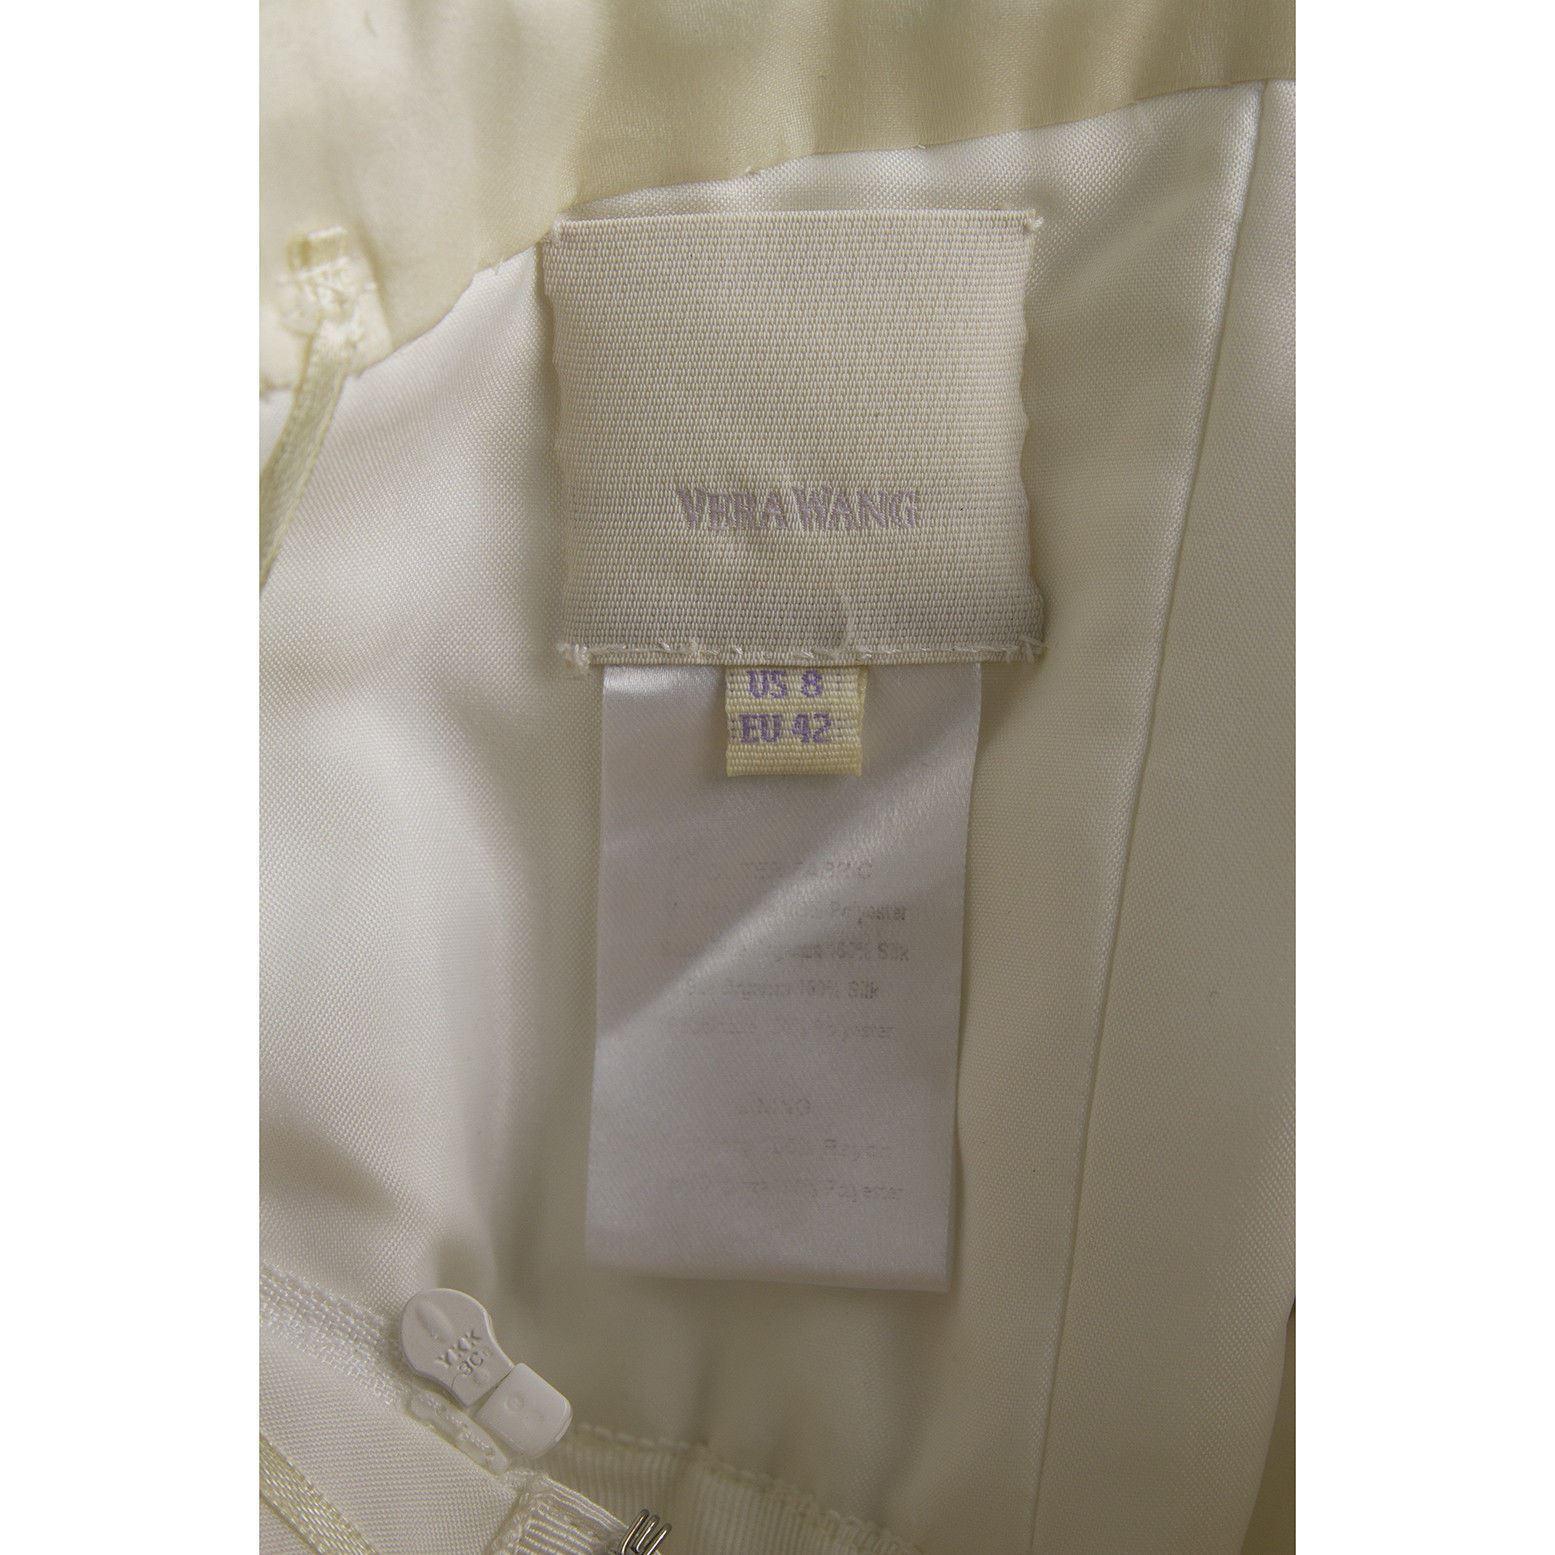 Vera Wang Silk Floor Length Bridal Wedding Gown Dress Strapless US 8 EU 42 image 5